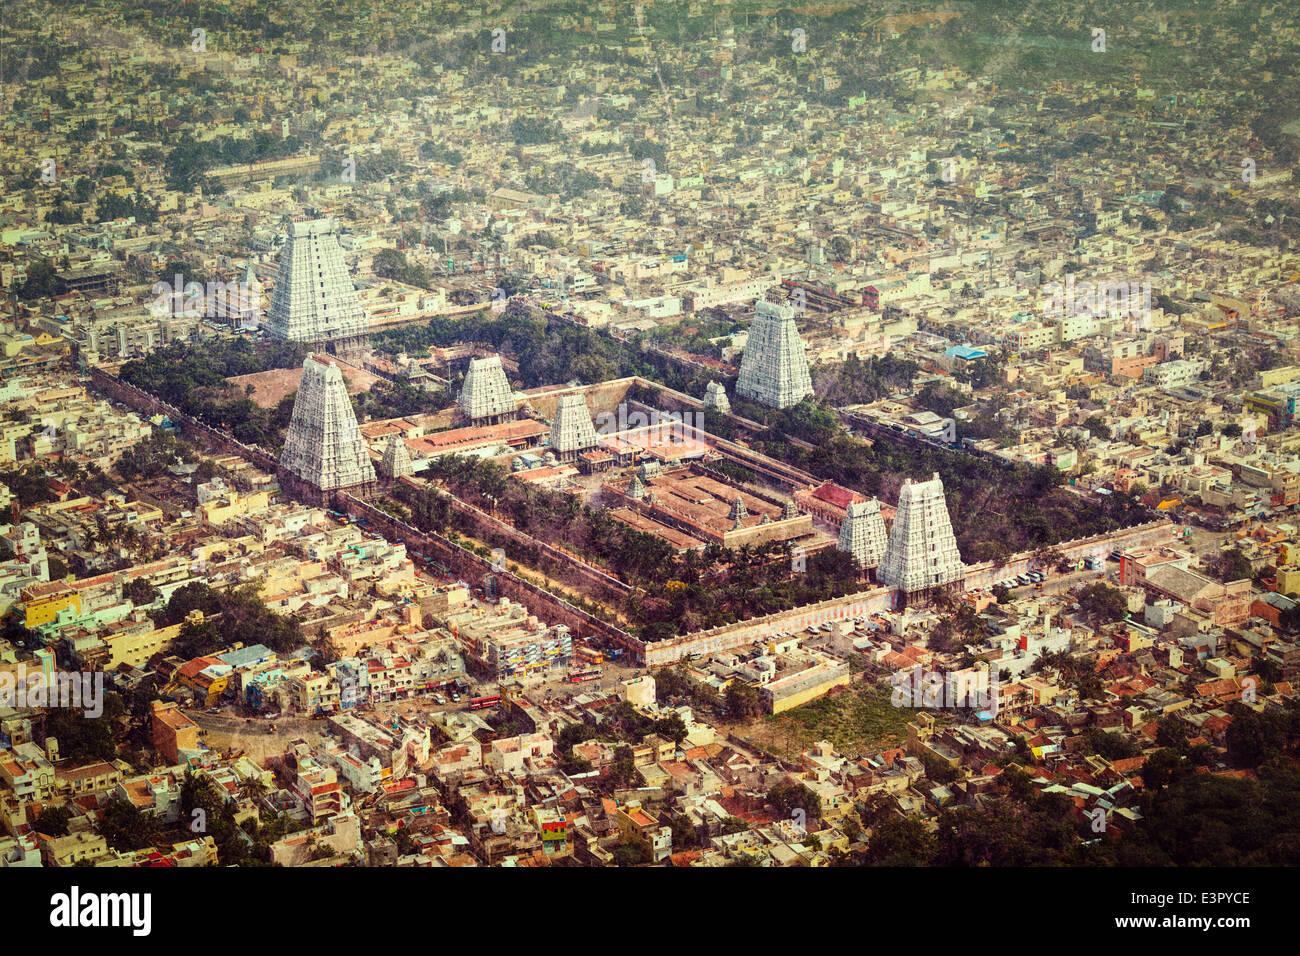 Vintage retro hipster style travel image Arulmigu Arunachaleswarar Hindu Temple and indian city Tiruvannamalai, - Stock Image